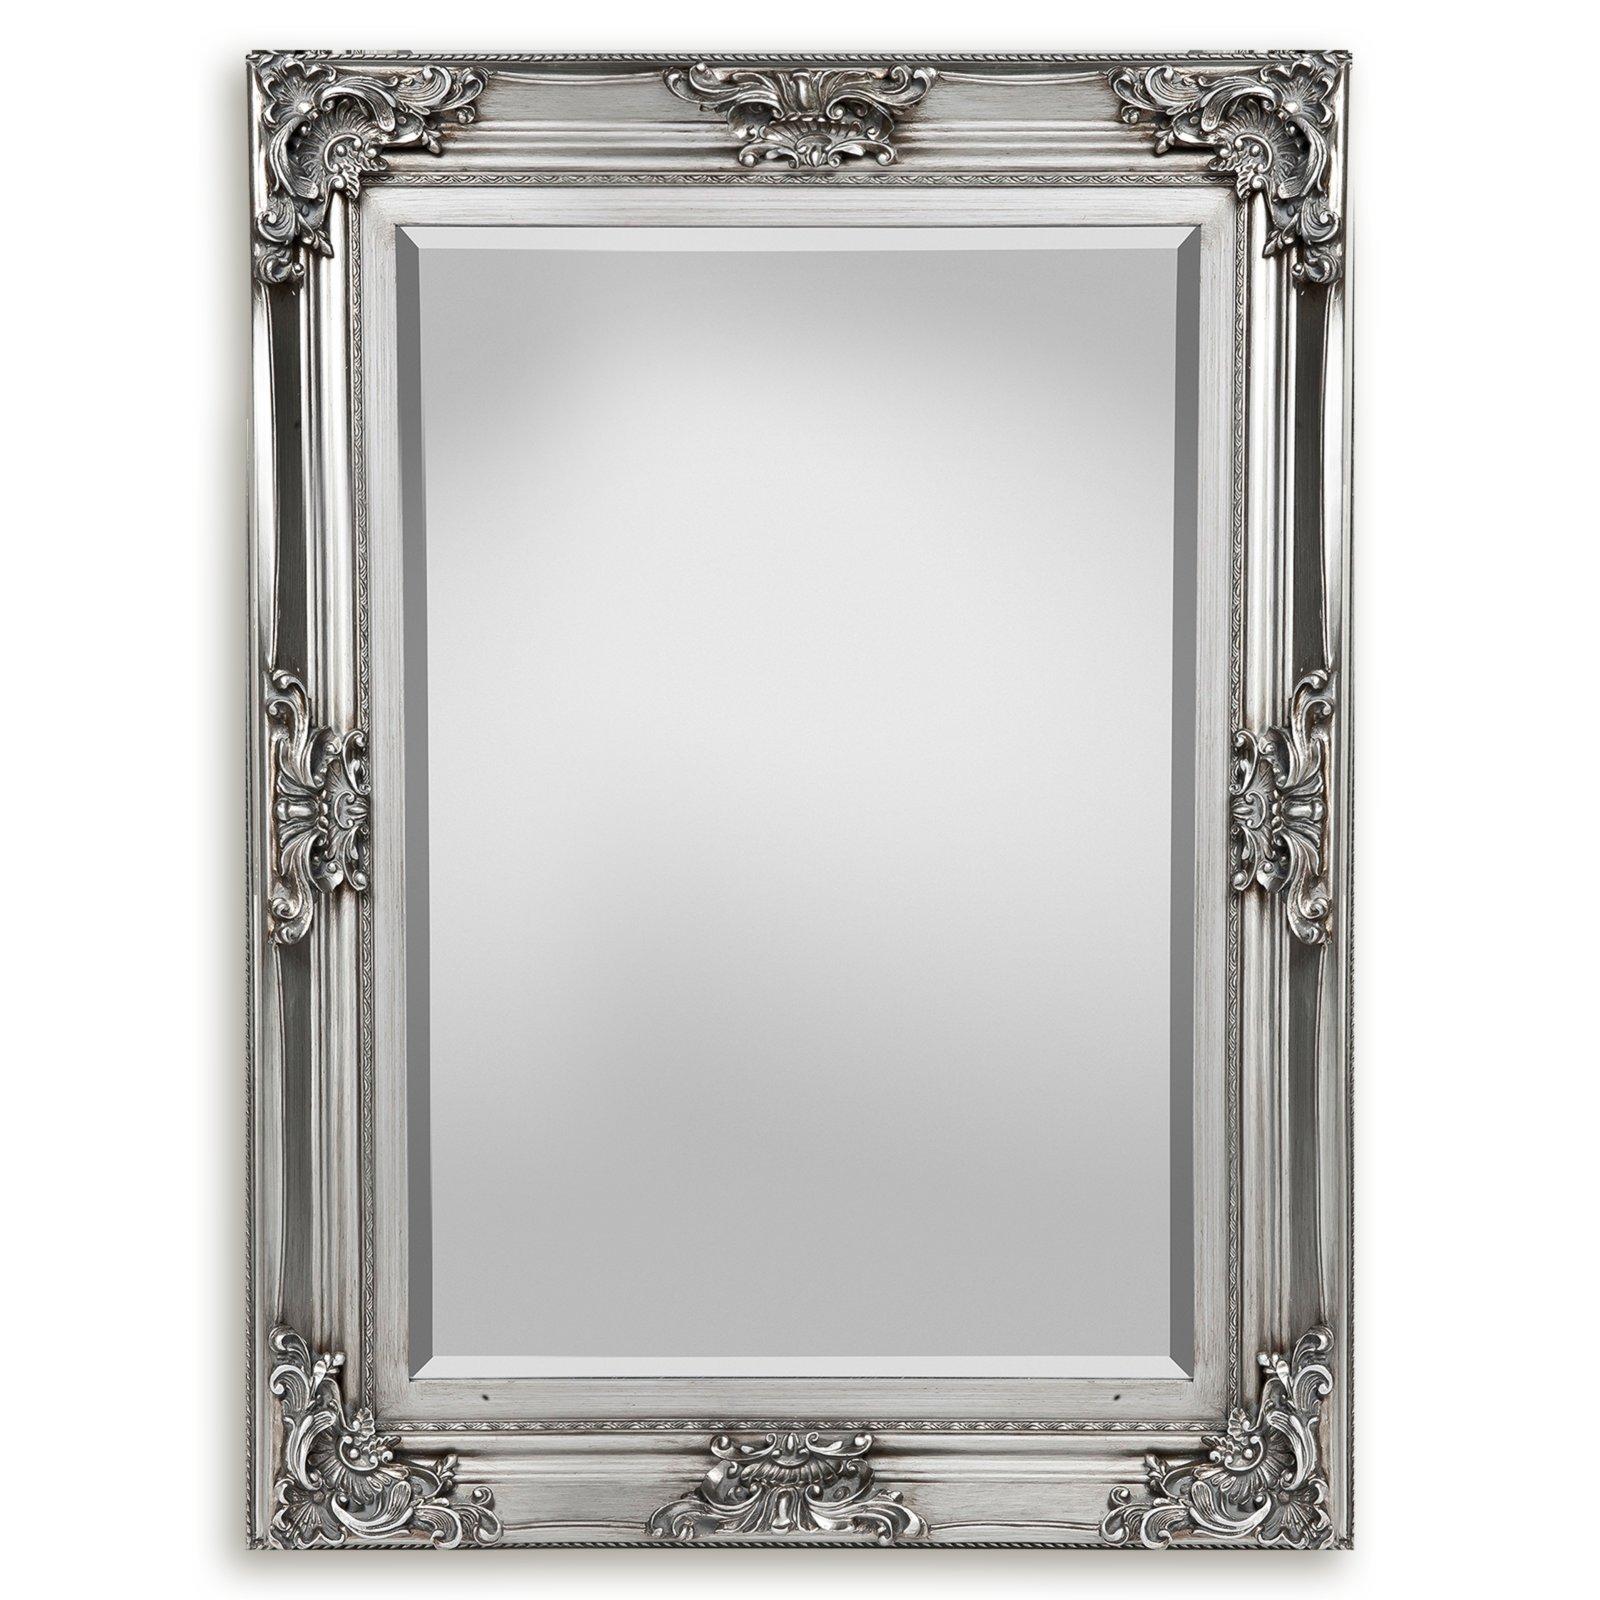 spiegel silber hochglanz 85x115 cm online bei roller. Black Bedroom Furniture Sets. Home Design Ideas